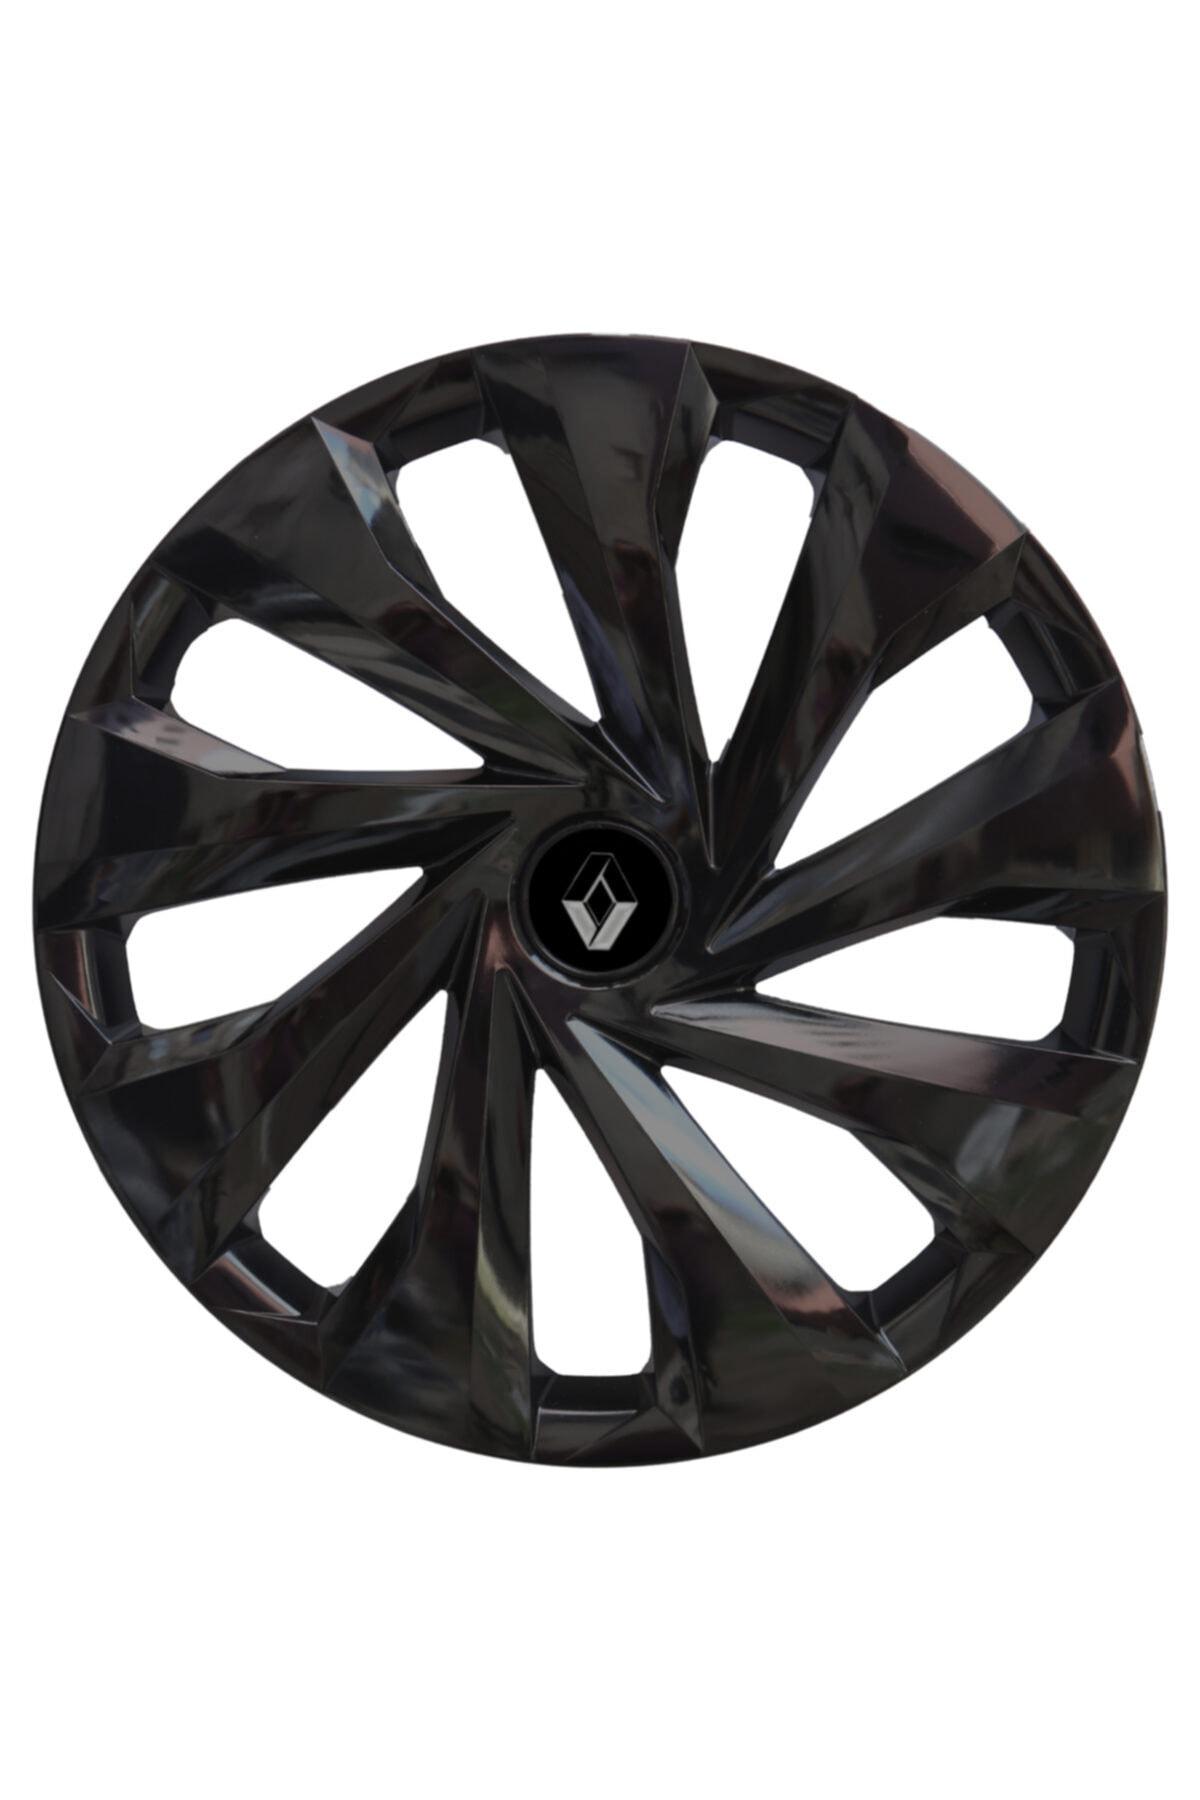 Bus Wheels & Tires